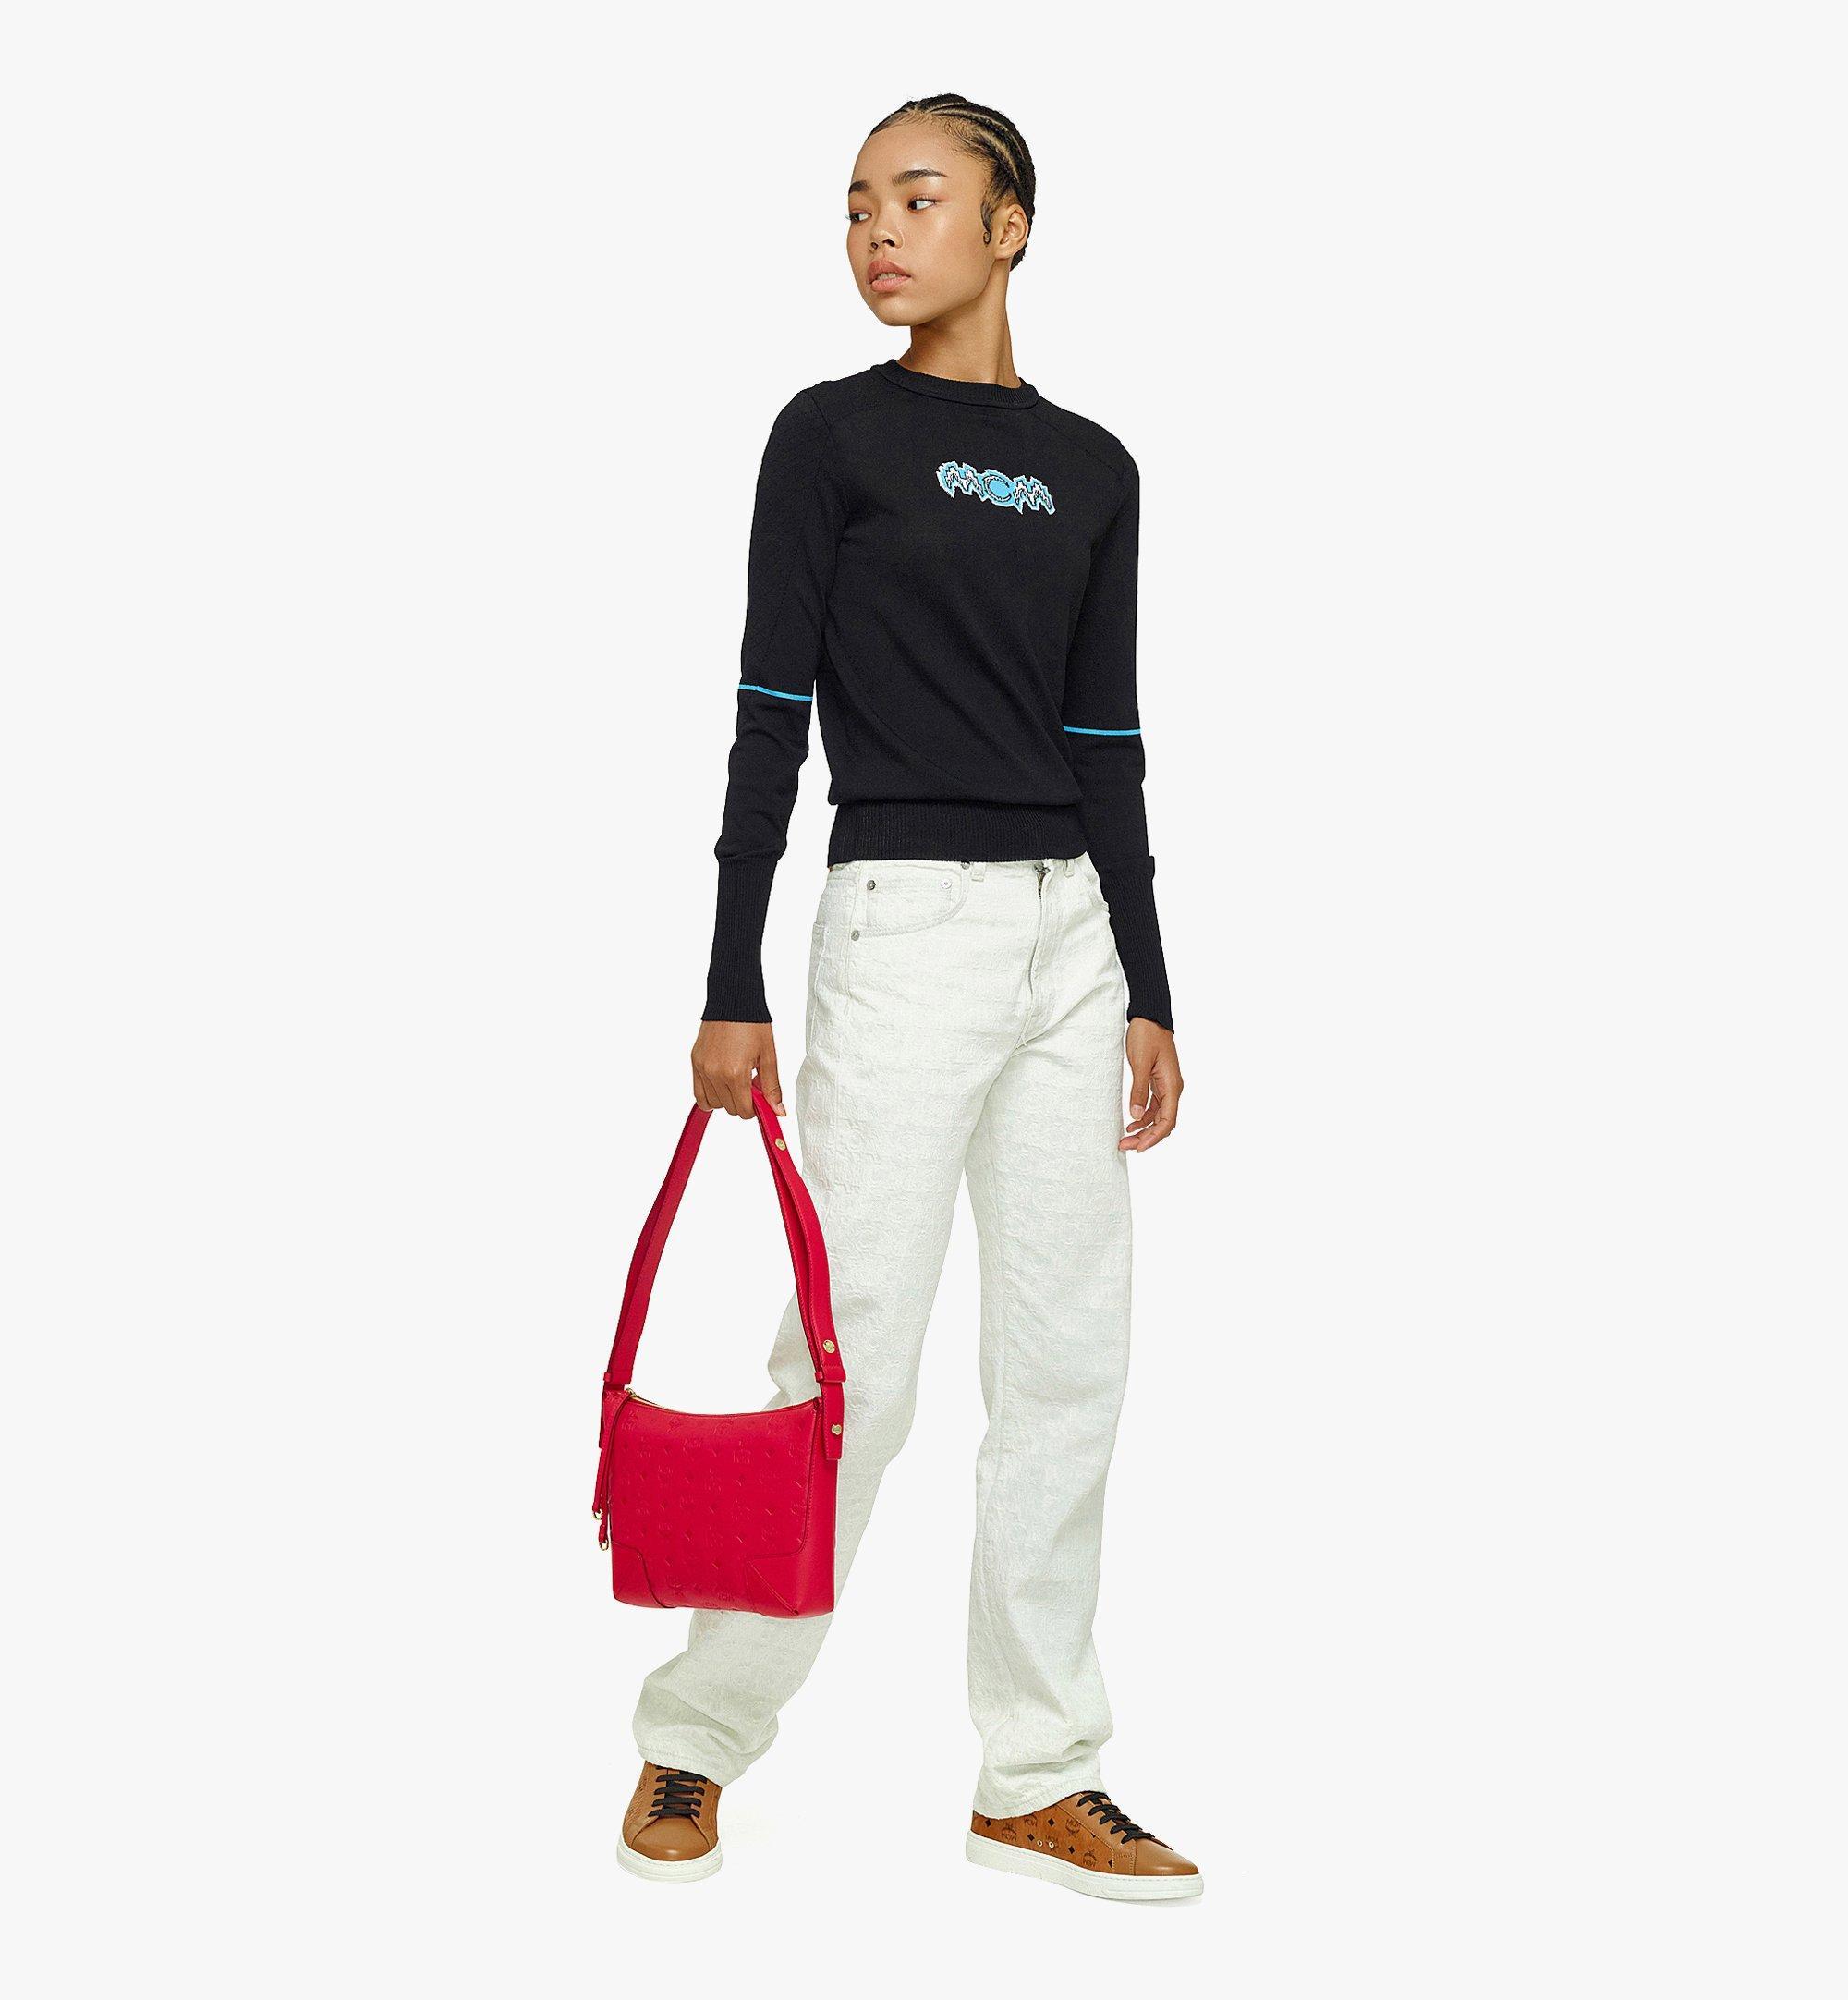 MCM Klara Shoulder Bag in Monogram Leather Red MWSBSKM02R0001 Alternate View 3